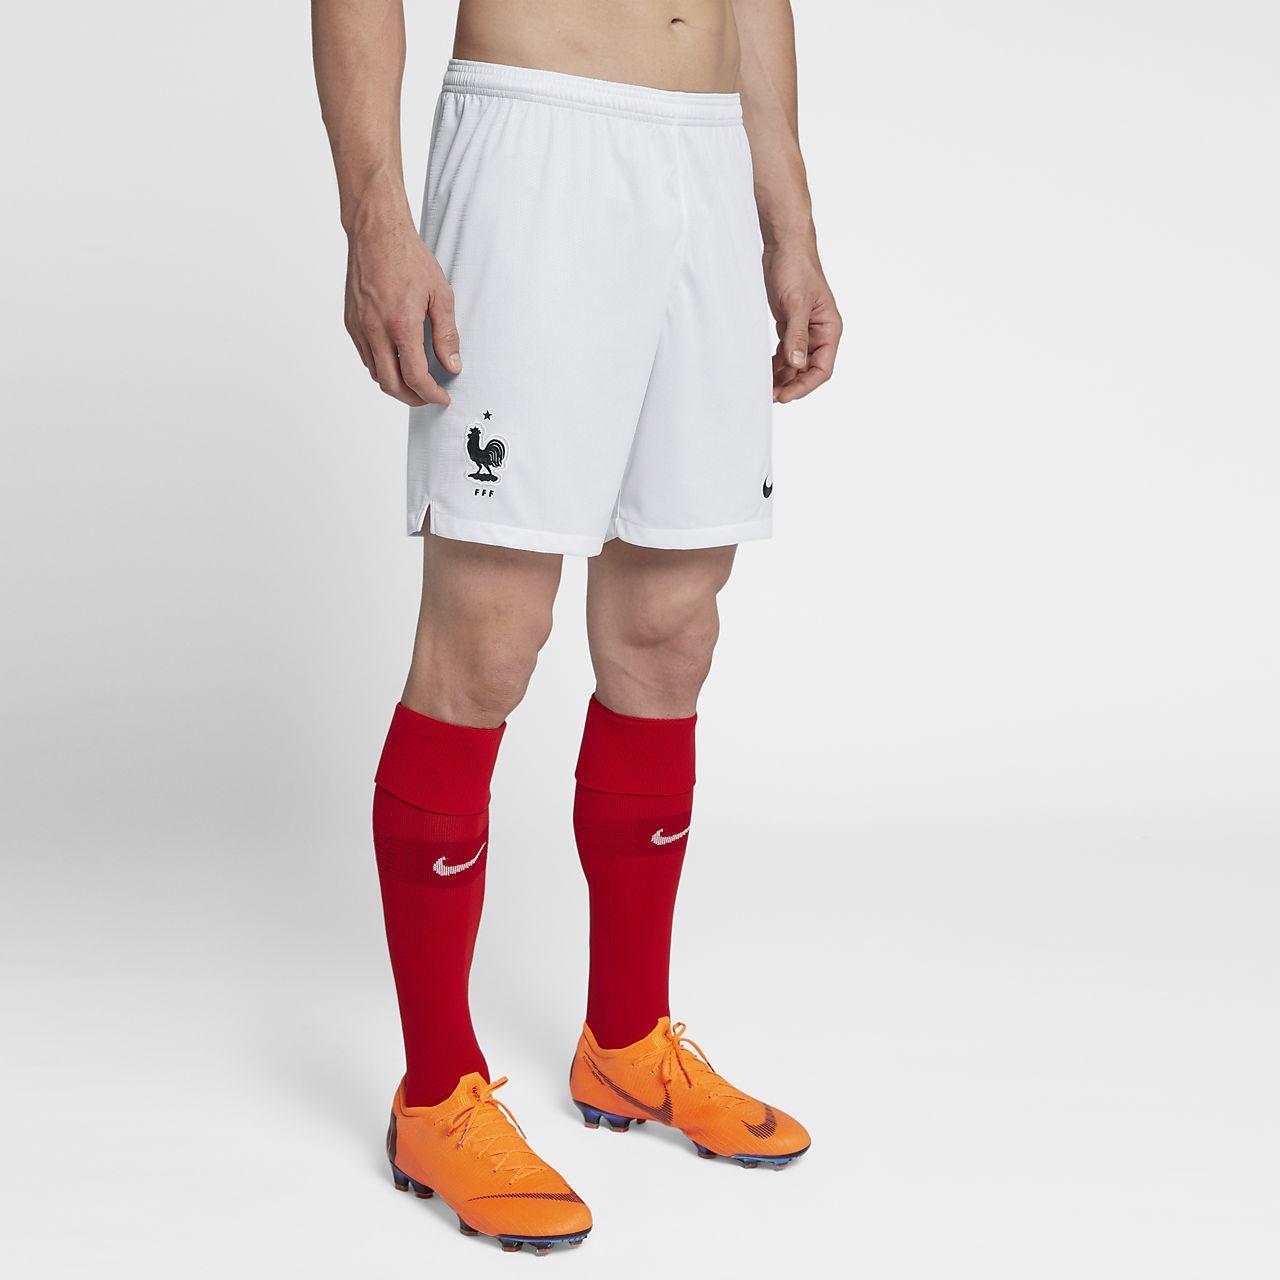 Shorts de fútbol para hombre 2018 FFF Stadium Home